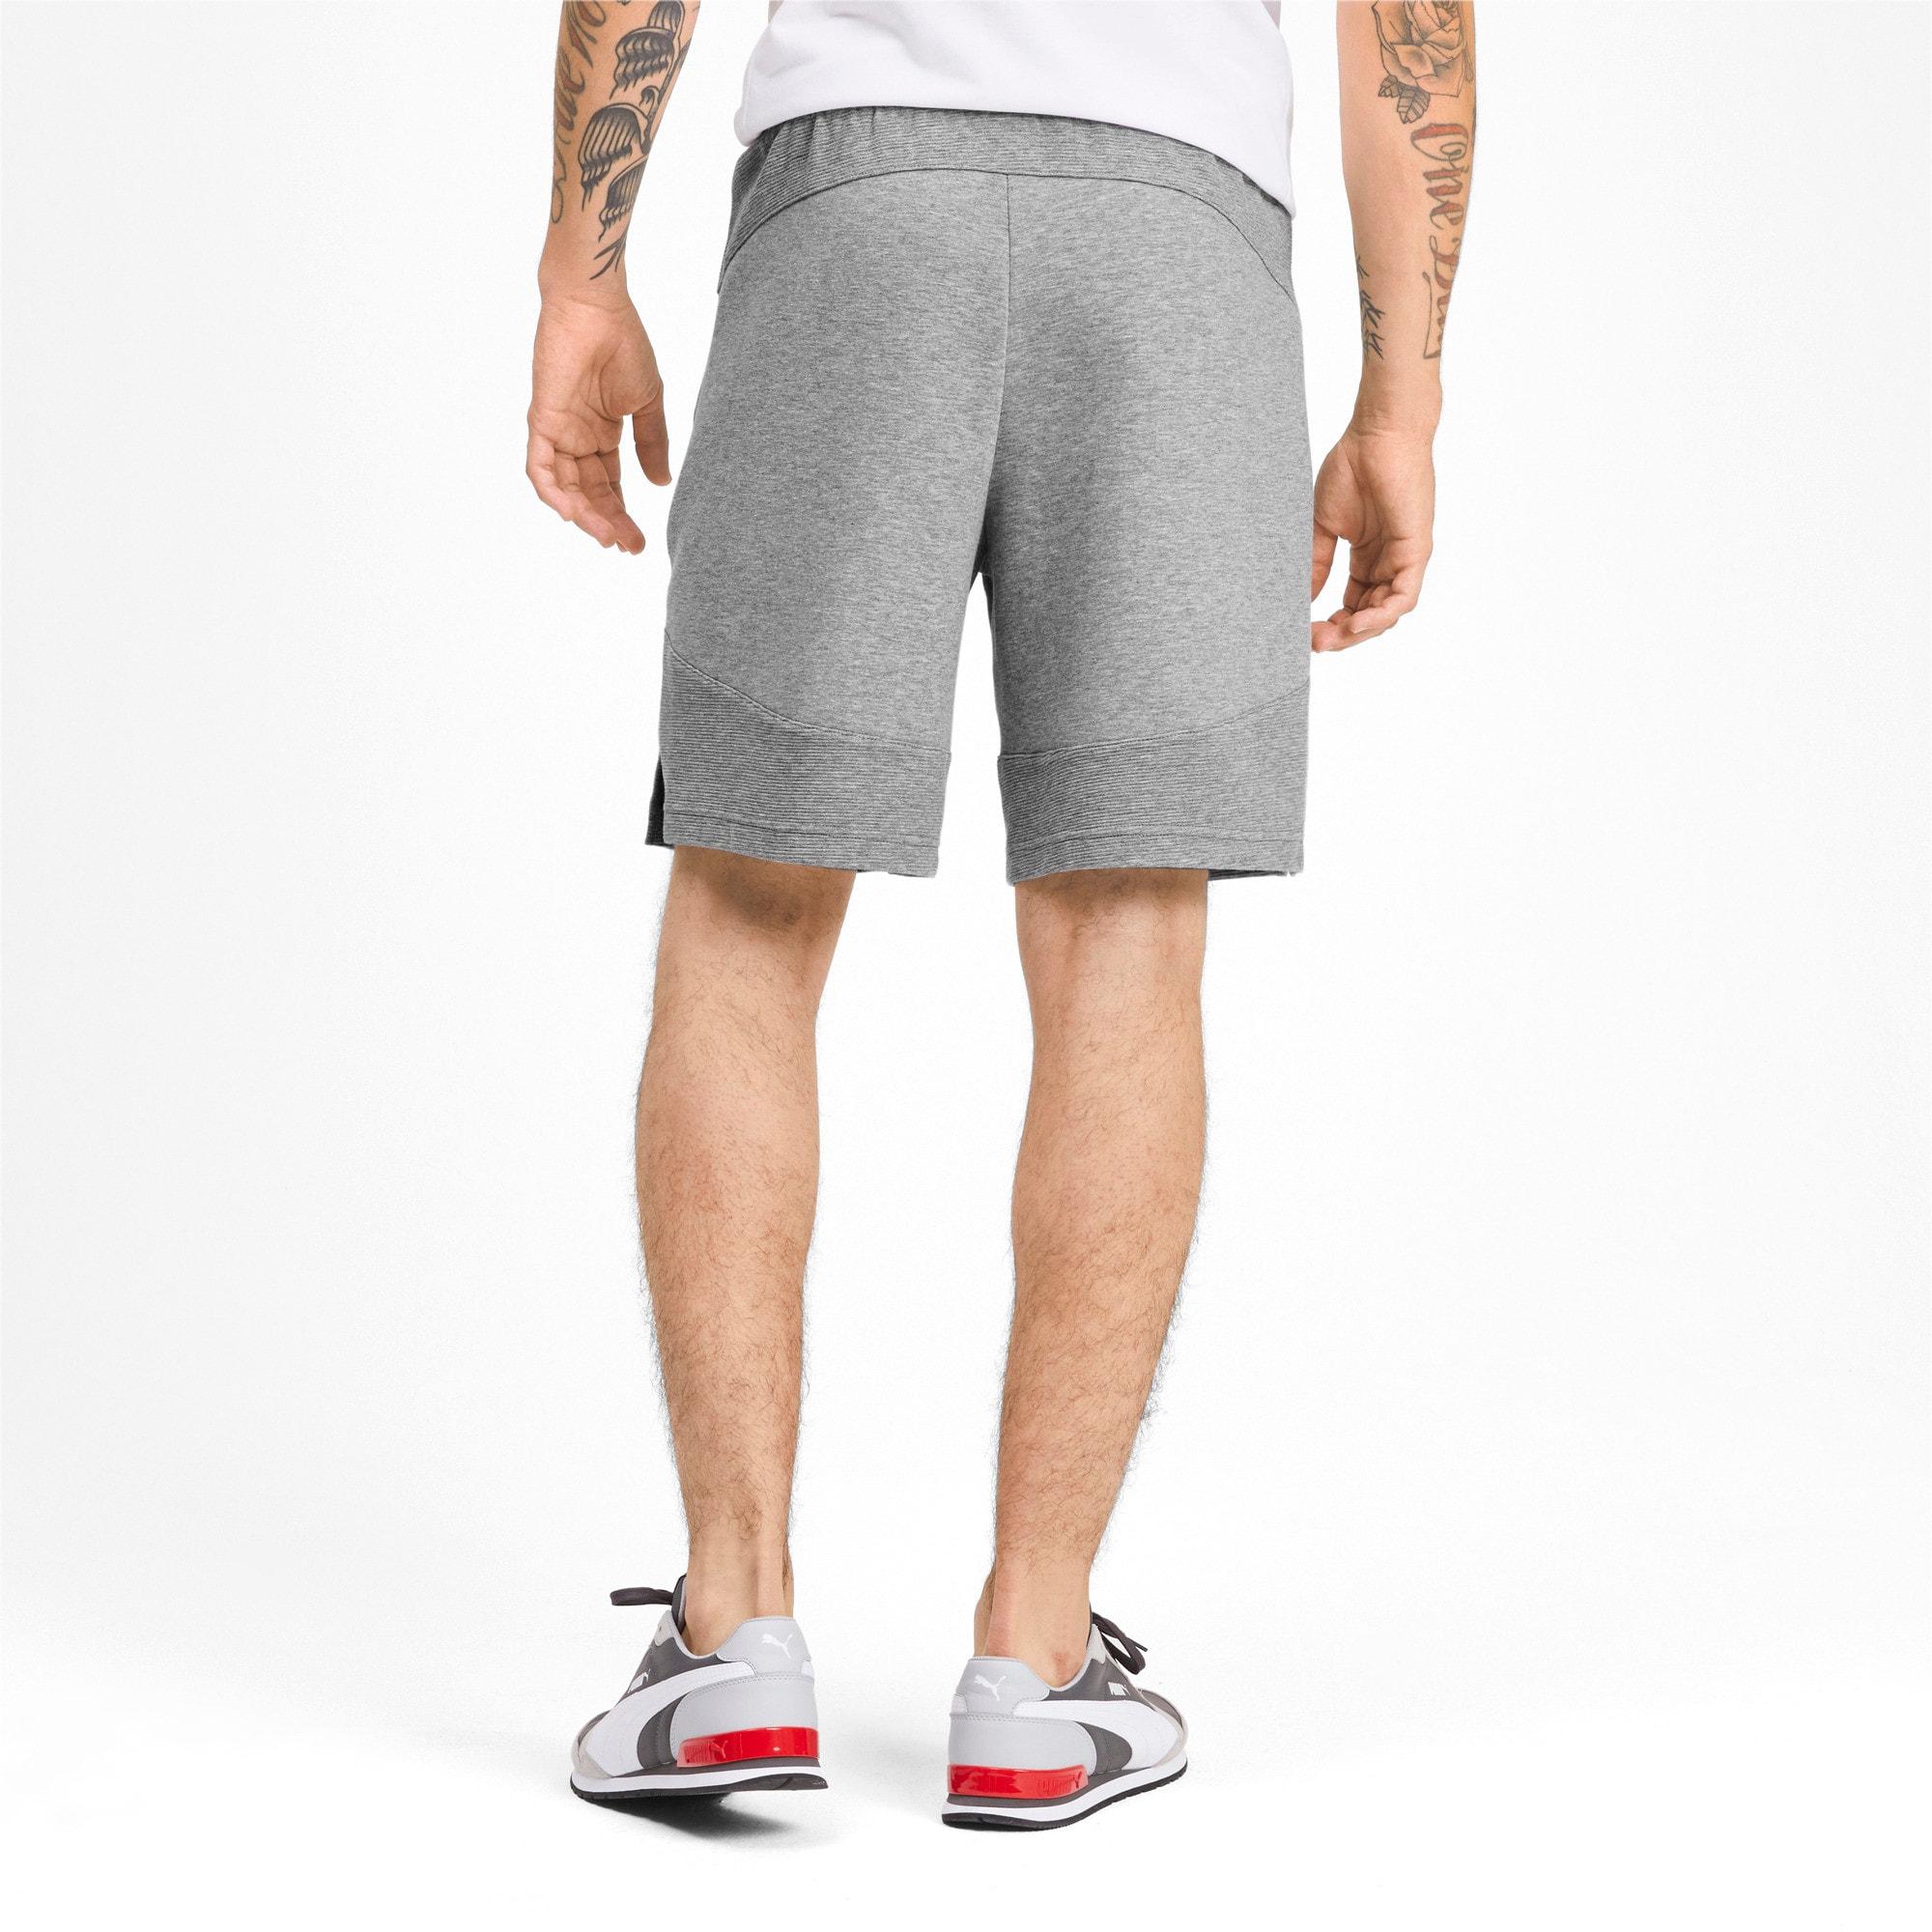 Thumbnail 2 of Evostripe Men's Shorts, Medium Gray Heather, medium